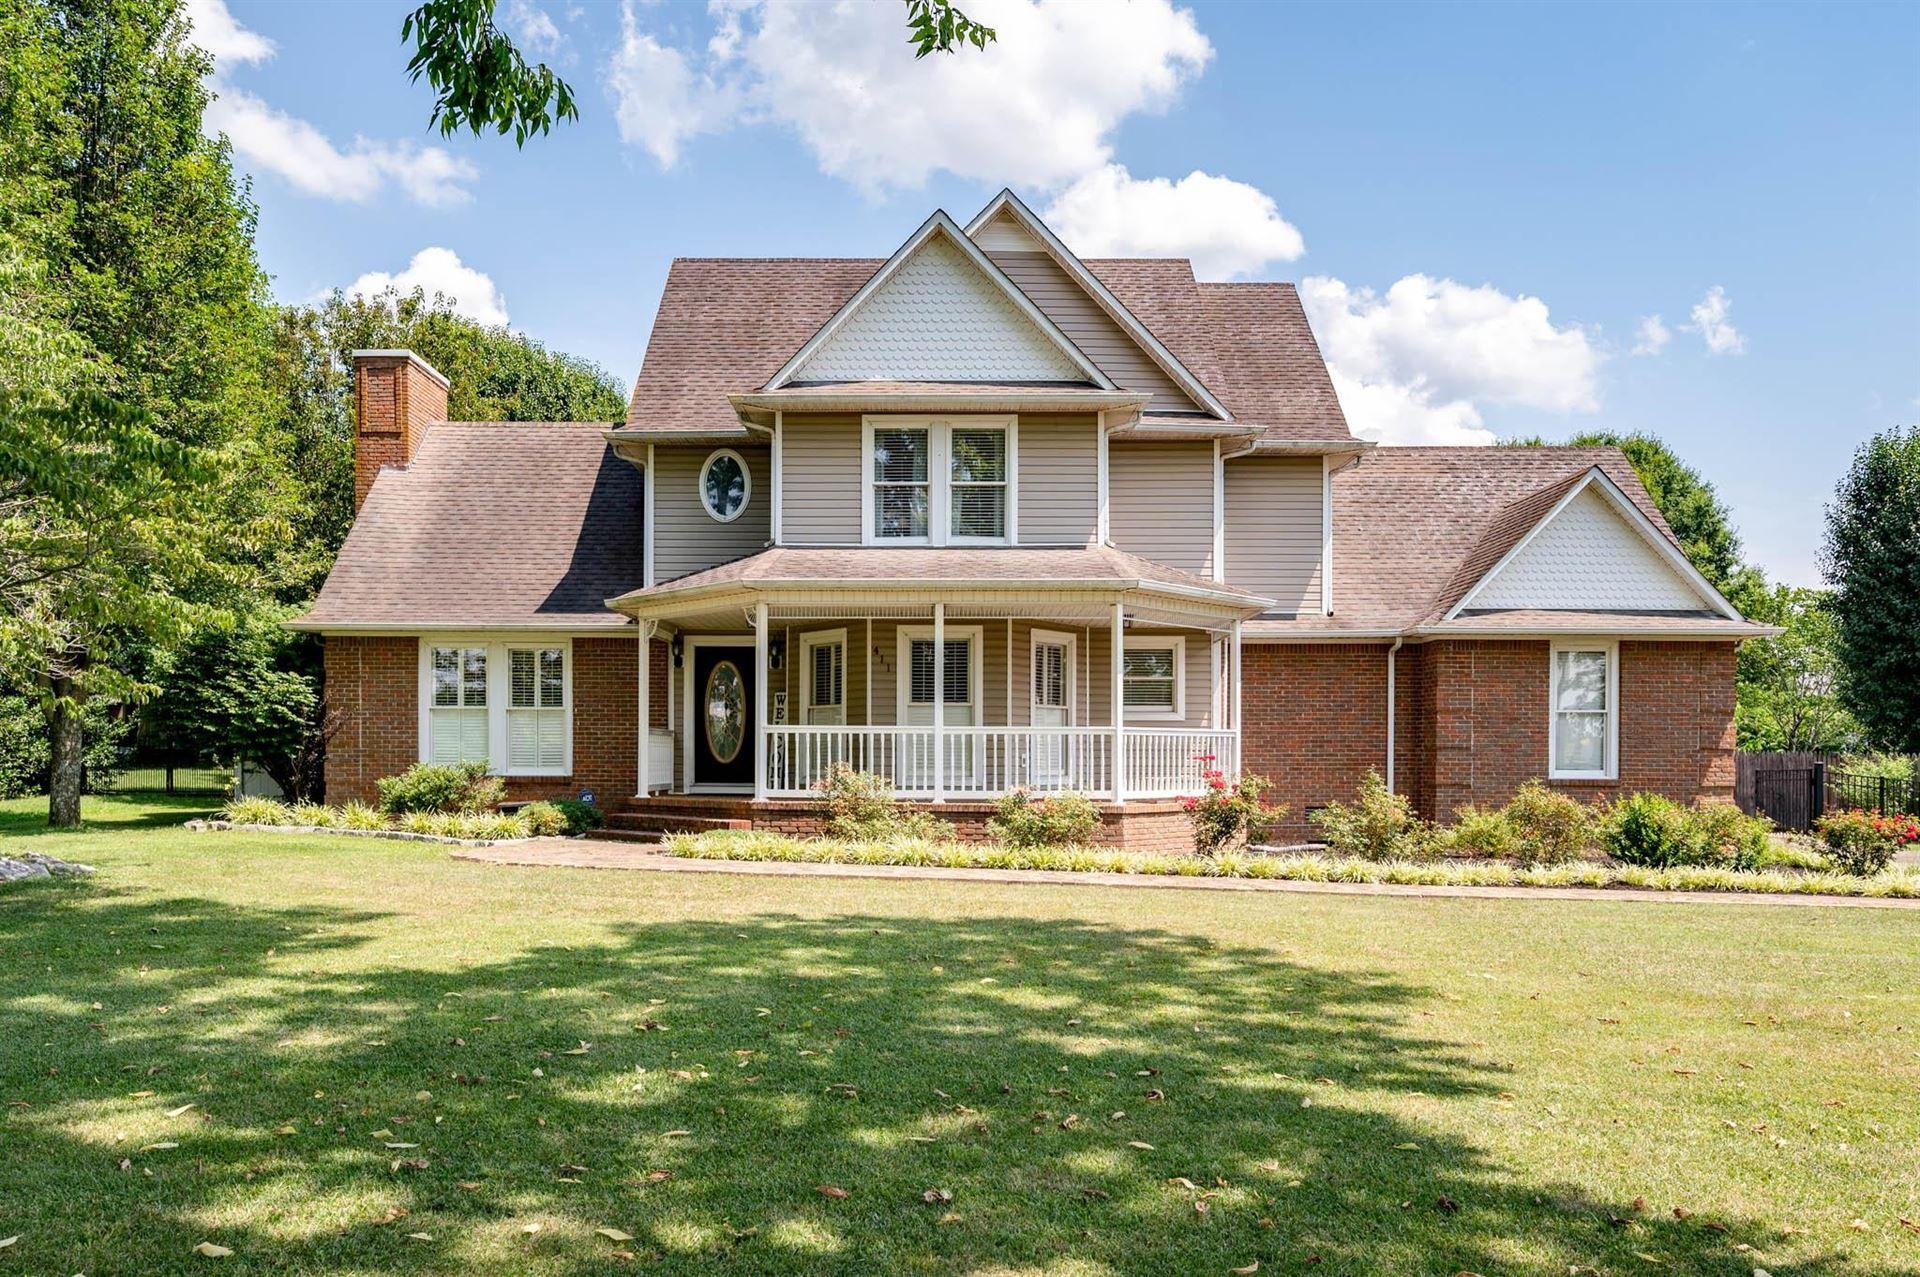 411 Sunnyside Ln, Columbia, TN 38401 - MLS#: 2270689